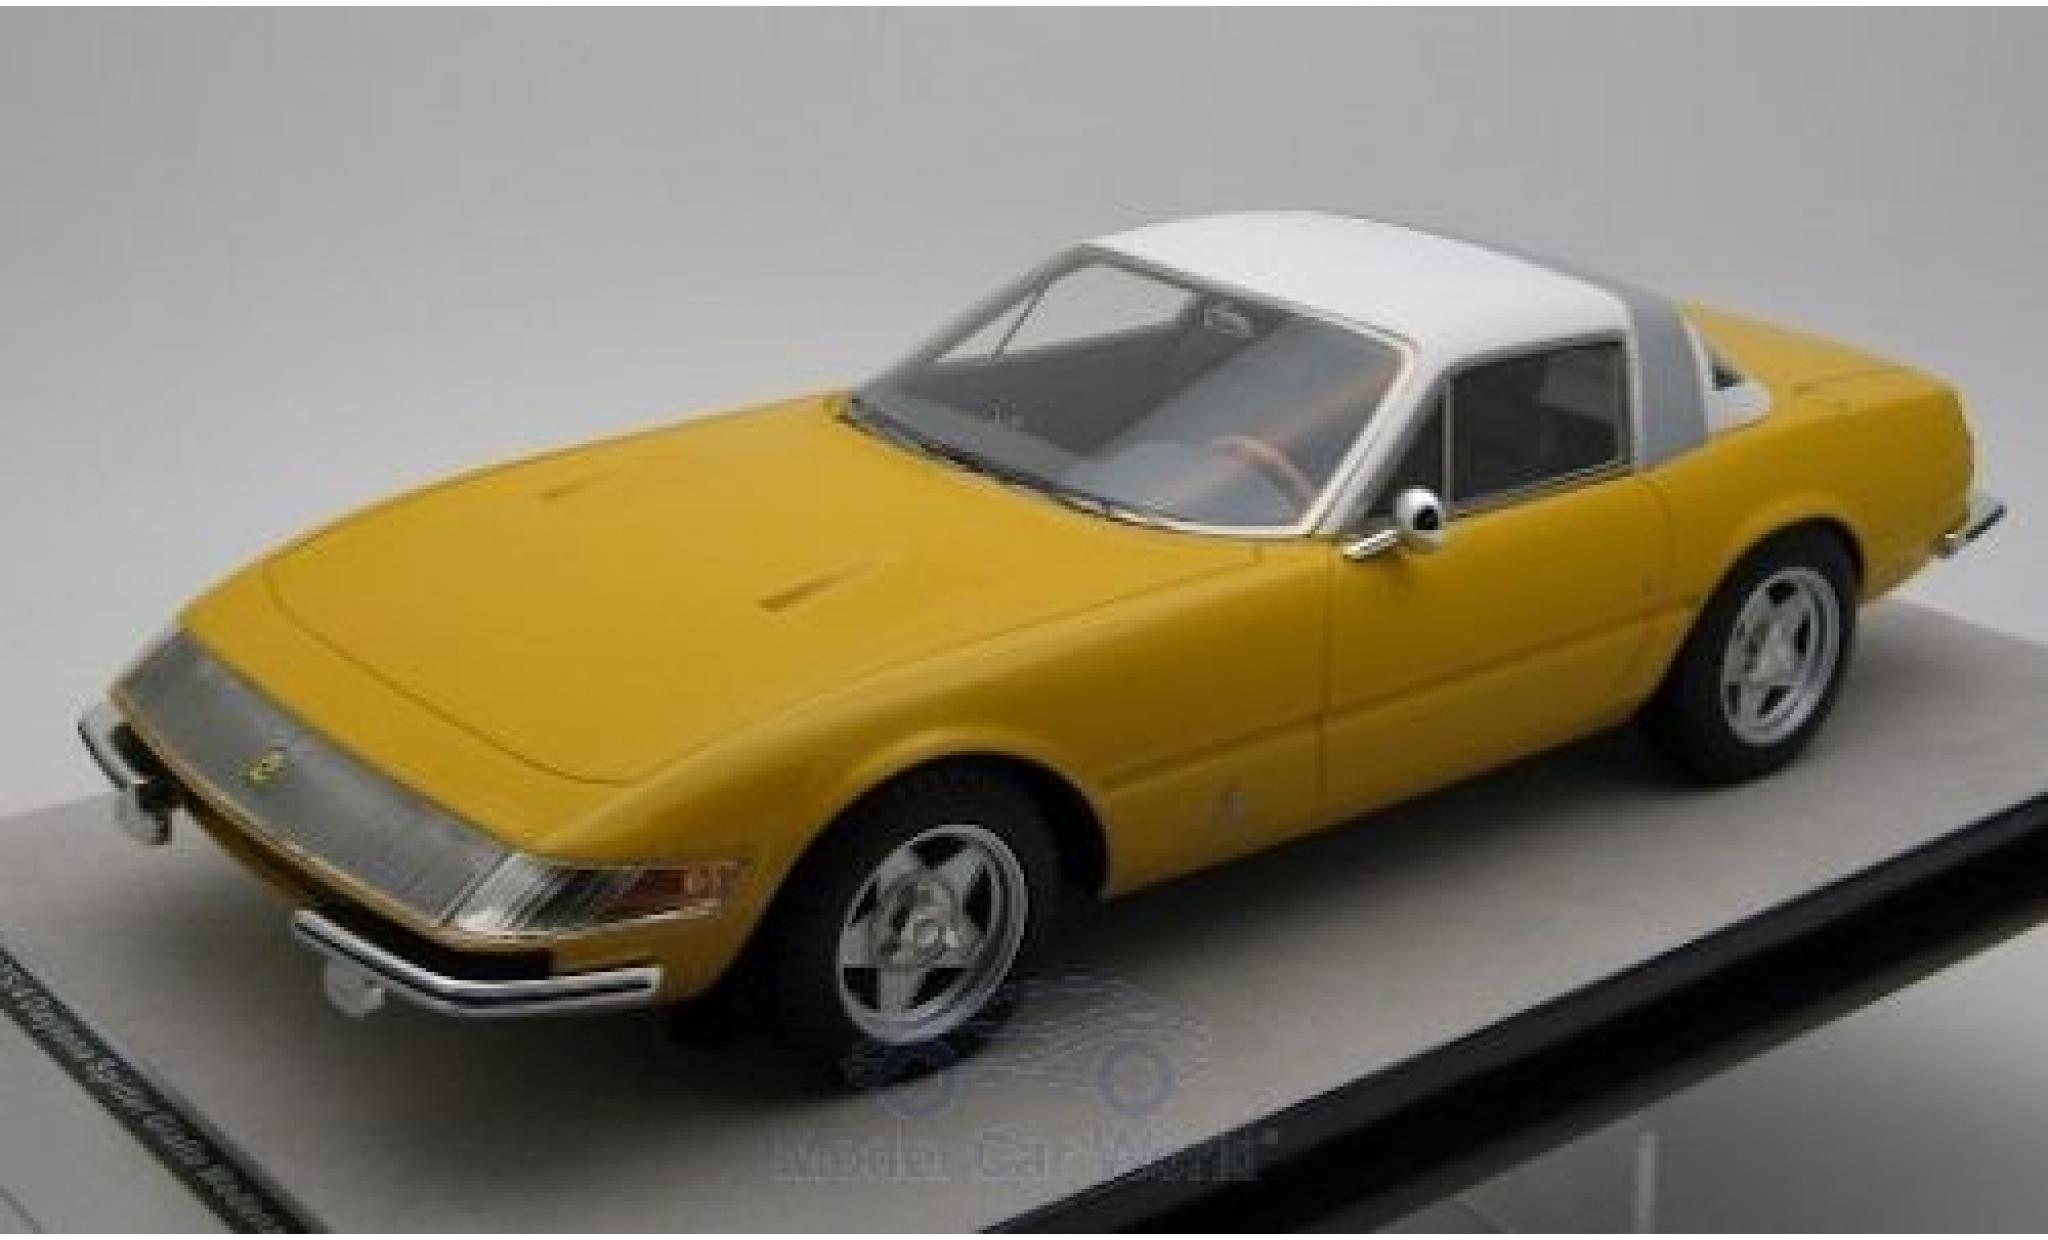 Ferrari 365 1/18 Tecnomodel GTB/4 Daytona Coupe Speciale jaune/blanche 1969